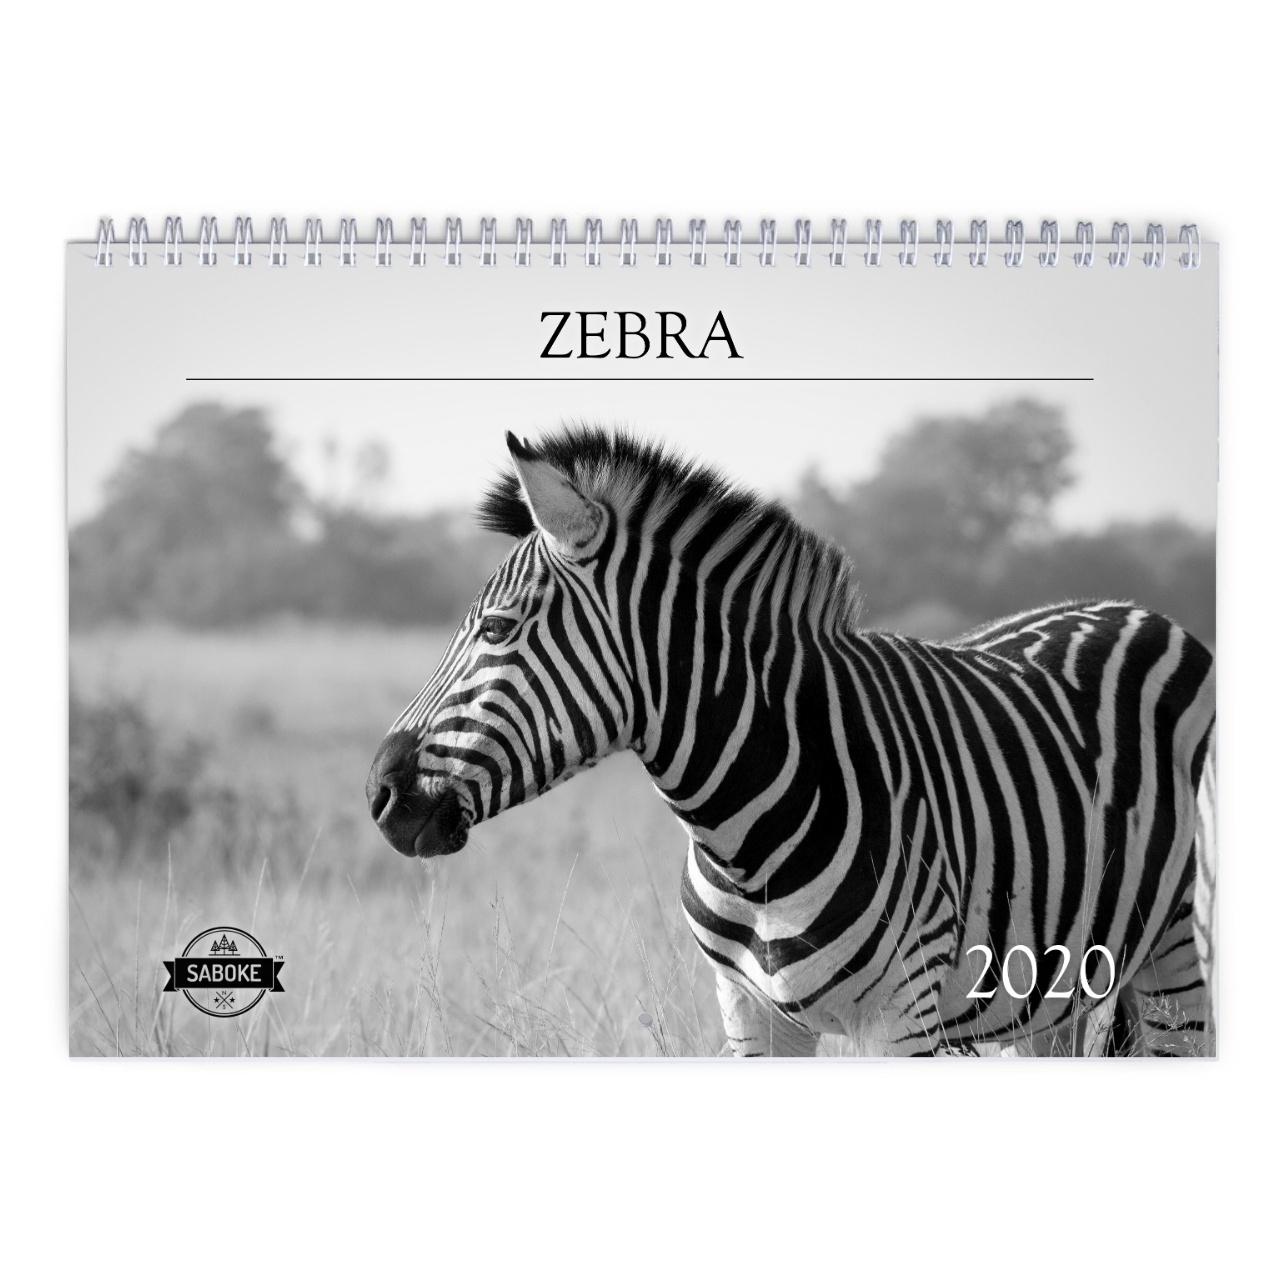 Zebra 2020 Calendar with regard to 2020 Calendar 8.5 X 11